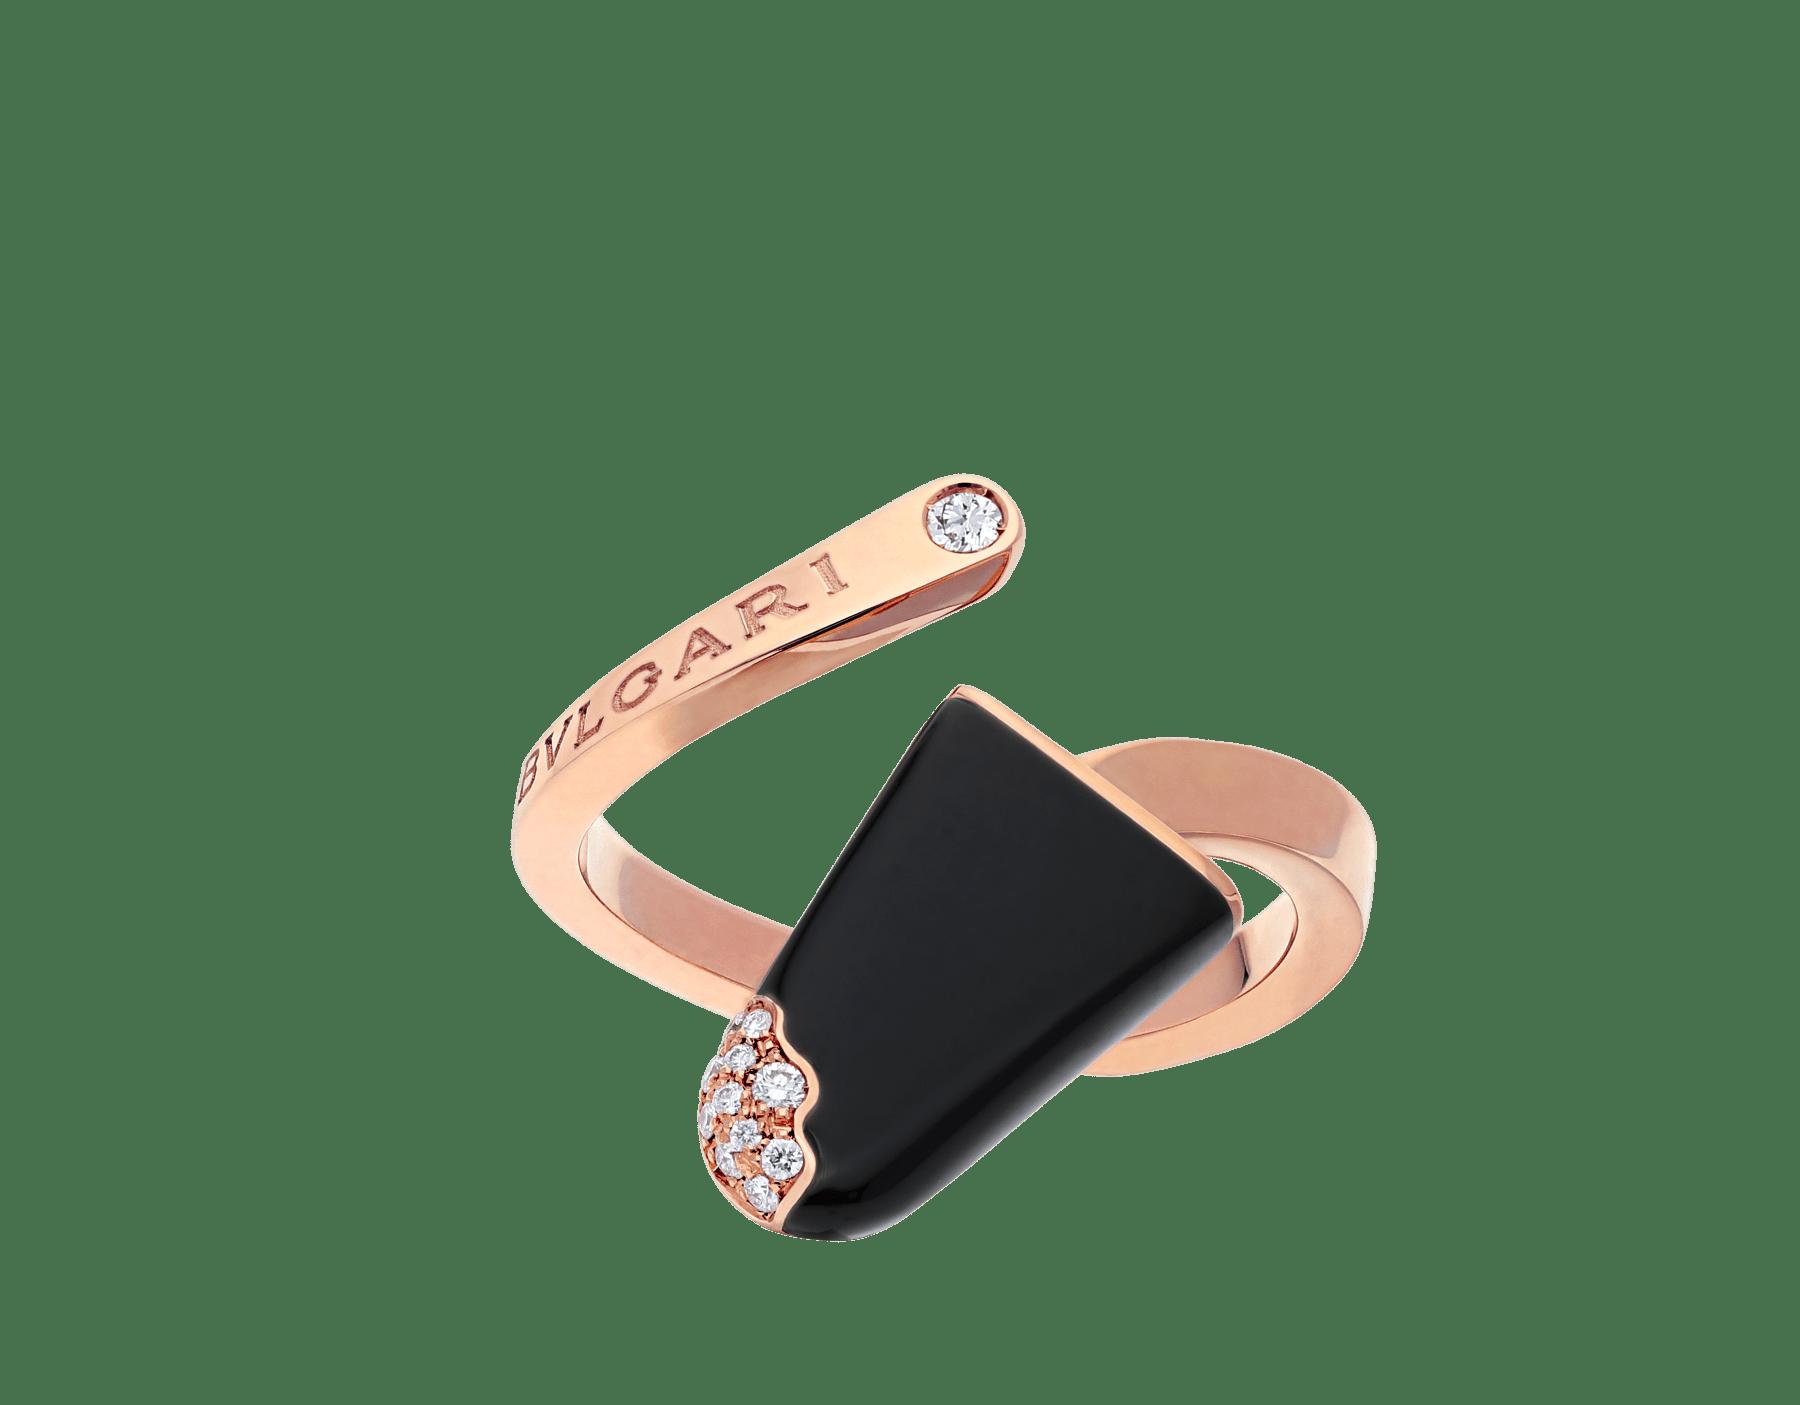 Bague BVLGARI BVLGARI Gelati en or rose 18K avec onyx et pavé diamants AN858499 image 1